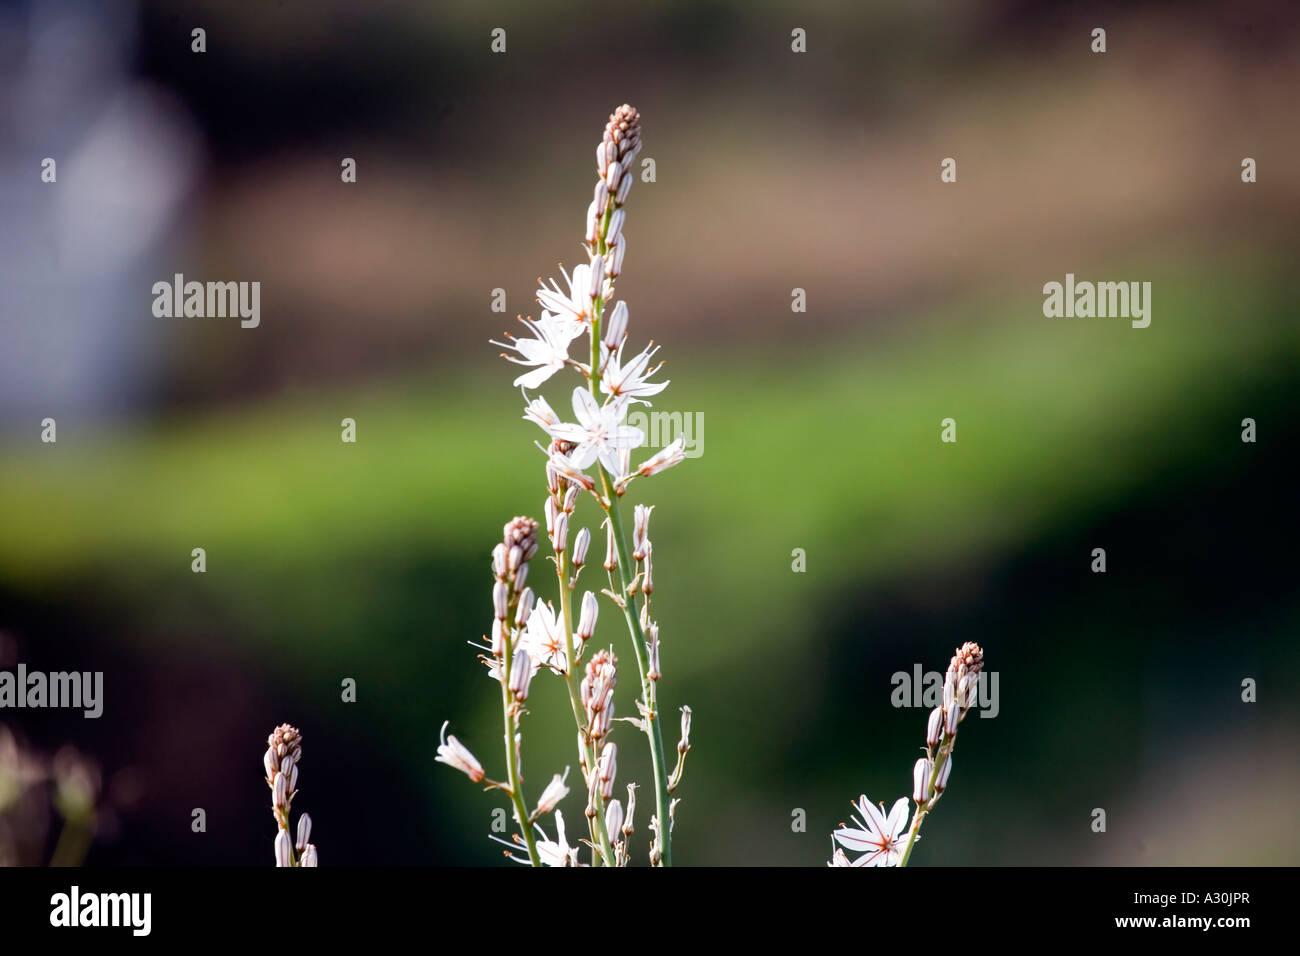 Common Asphodel (Asphodelus aestivus) growing in Spain Stock Photo